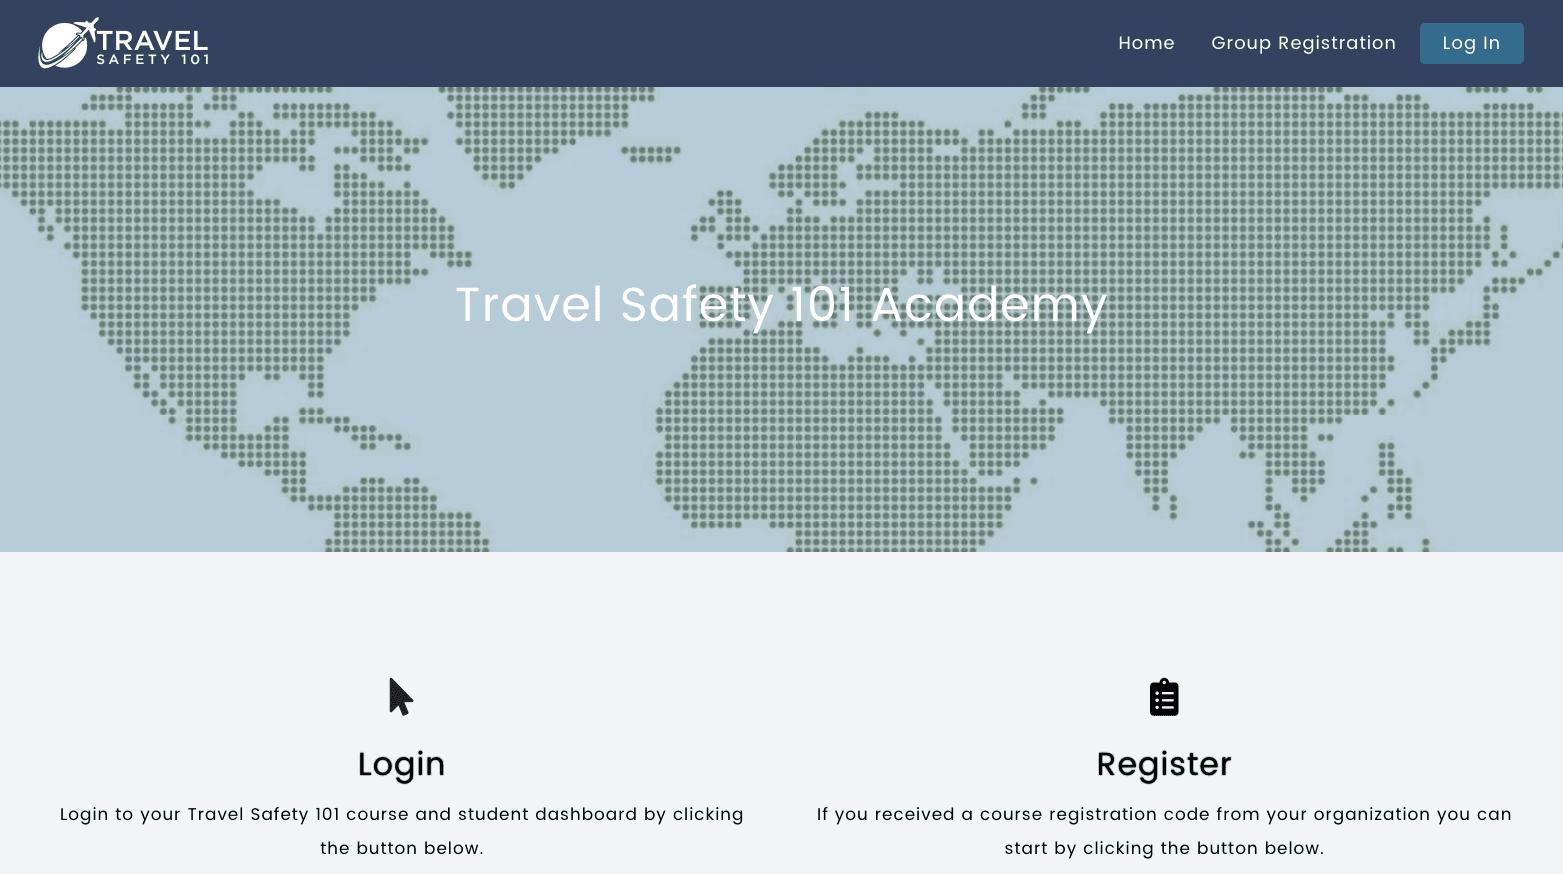 Travel Safety 101